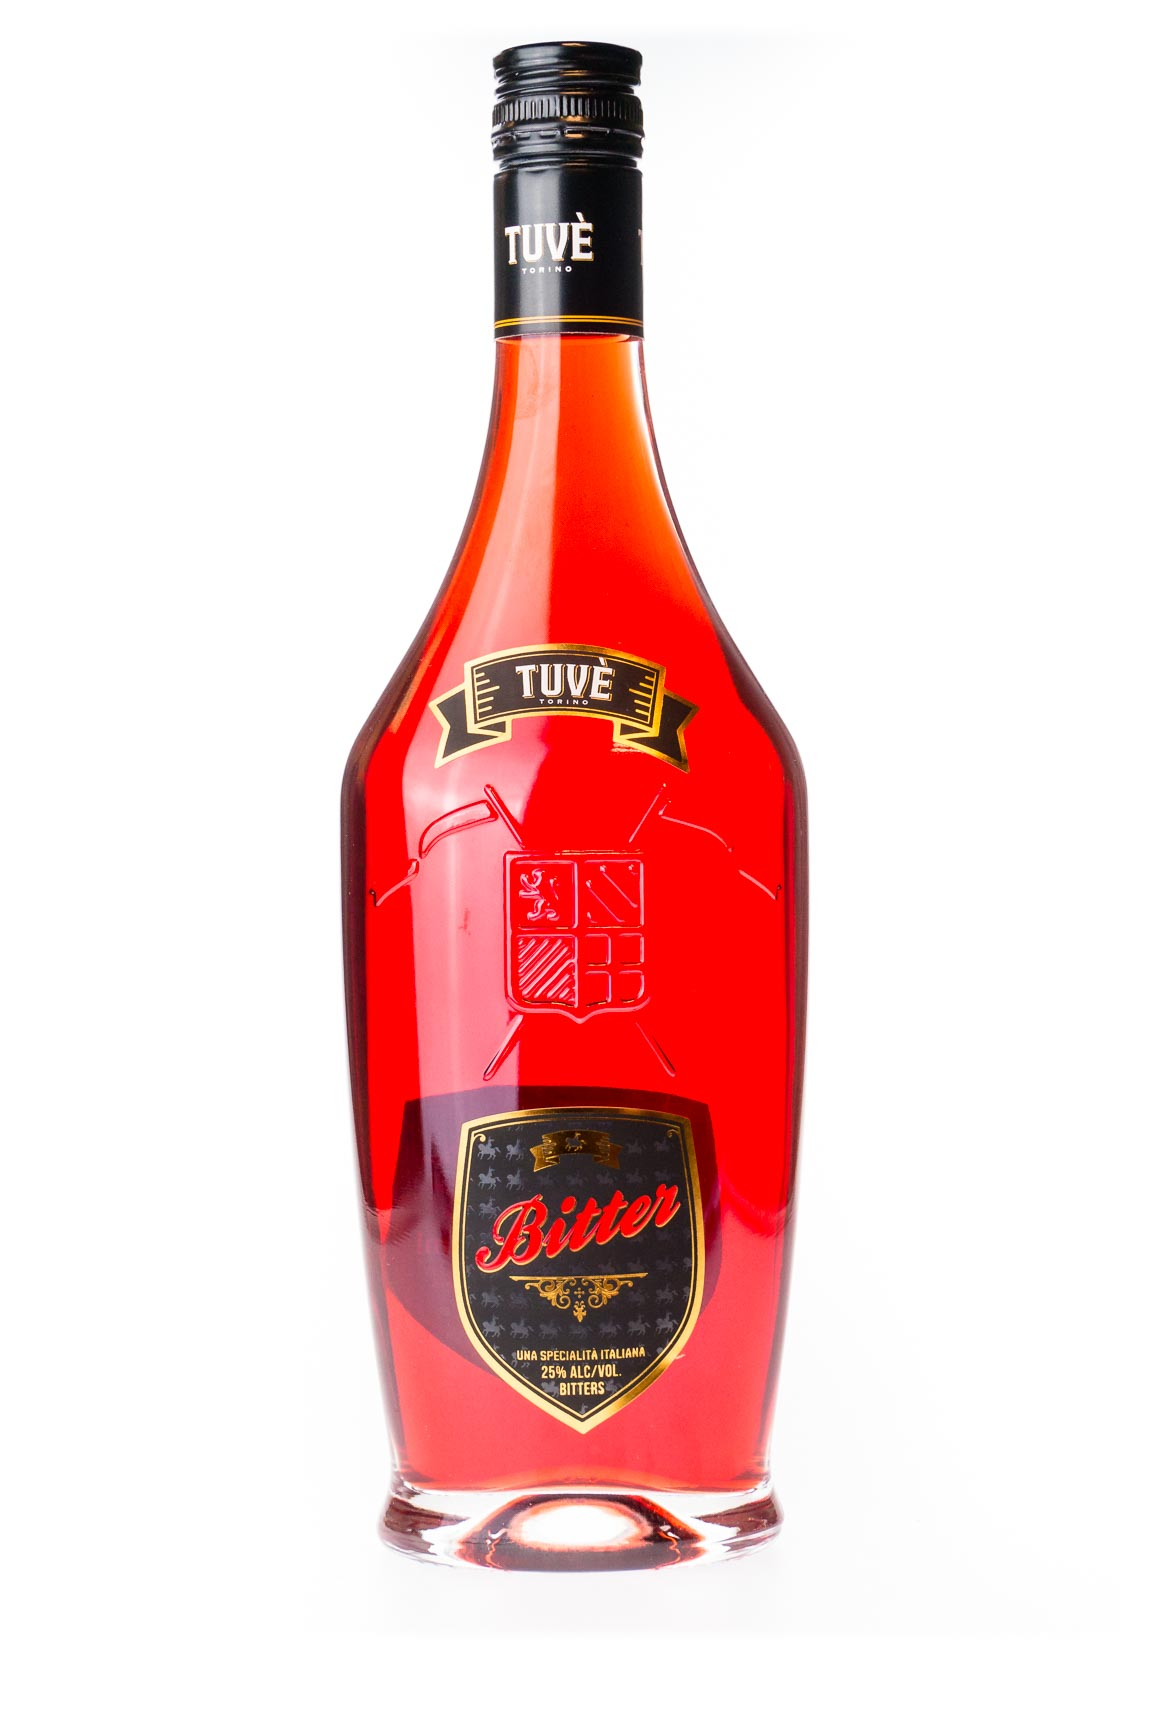 Tuvé Bitter kaufen ab 16 17 EUR im Bitter Shop